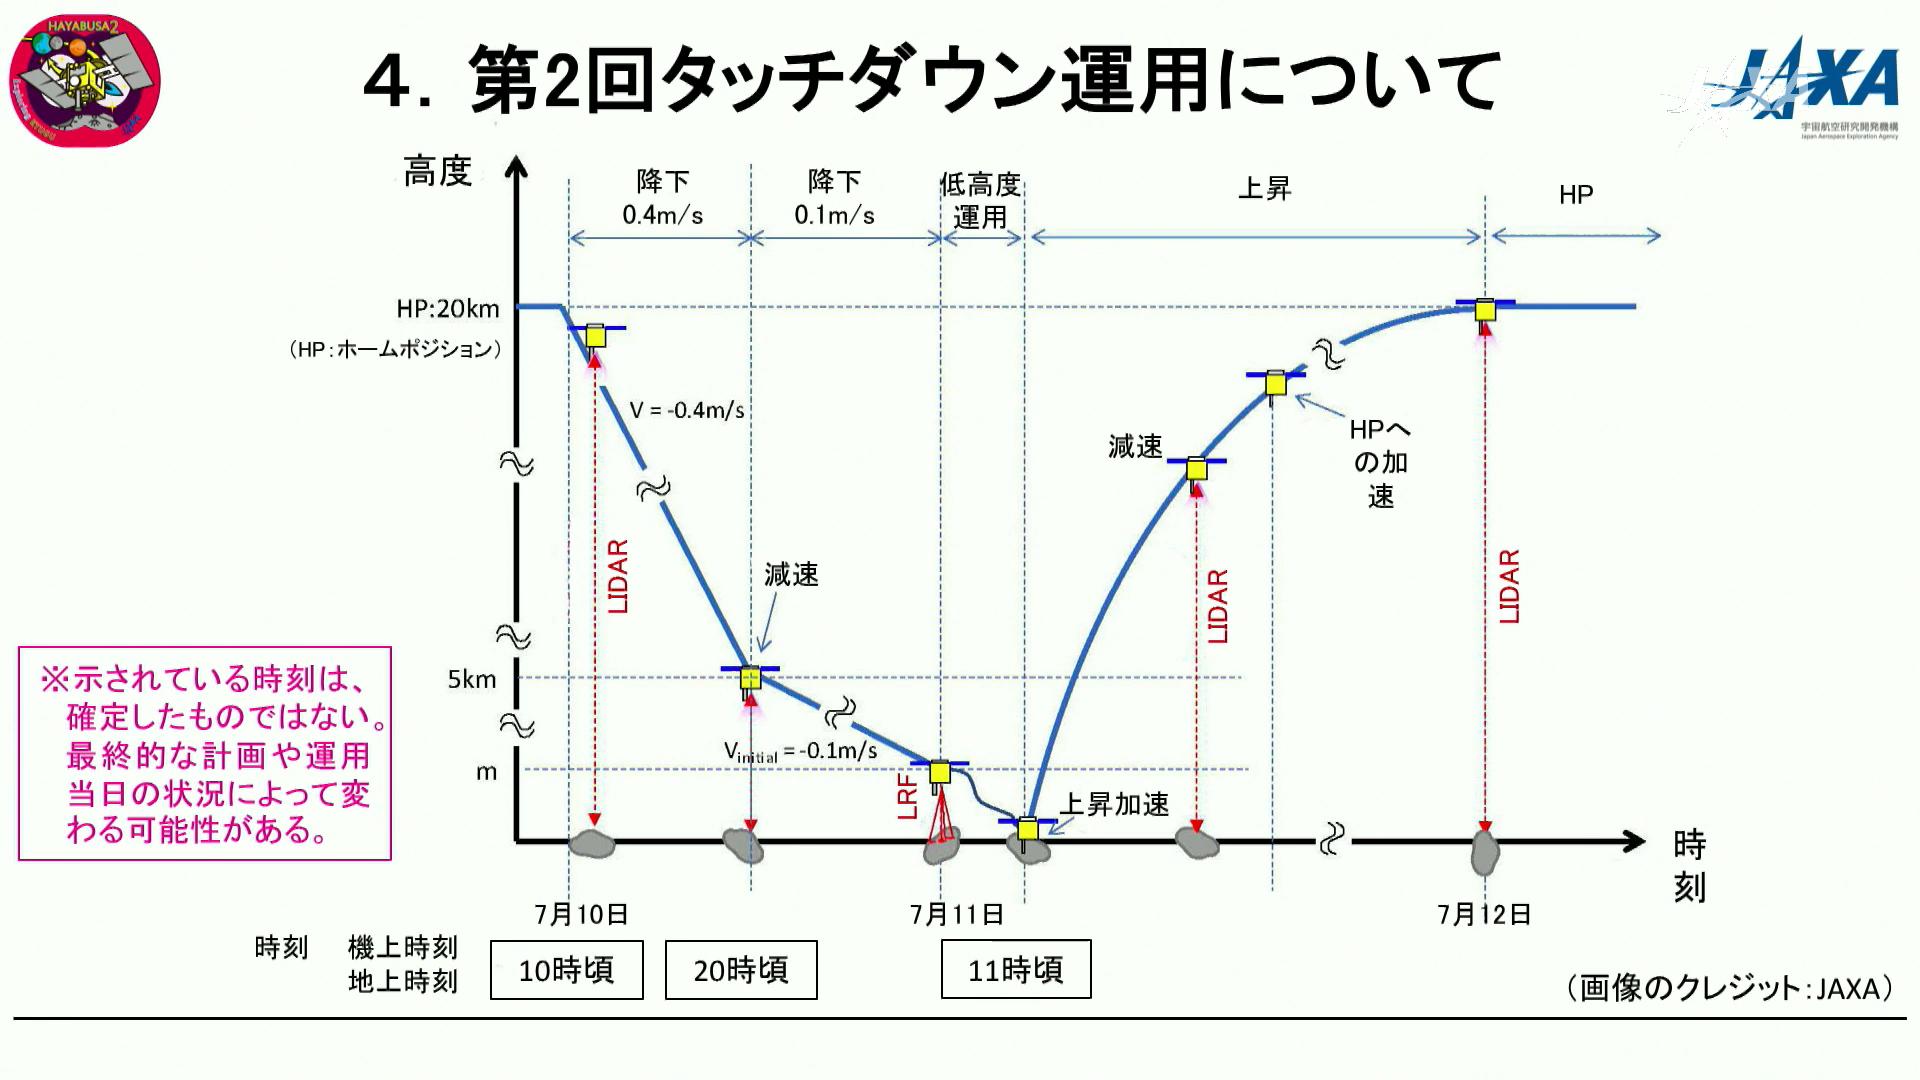 f:id:Imamura:20190625234817p:plain